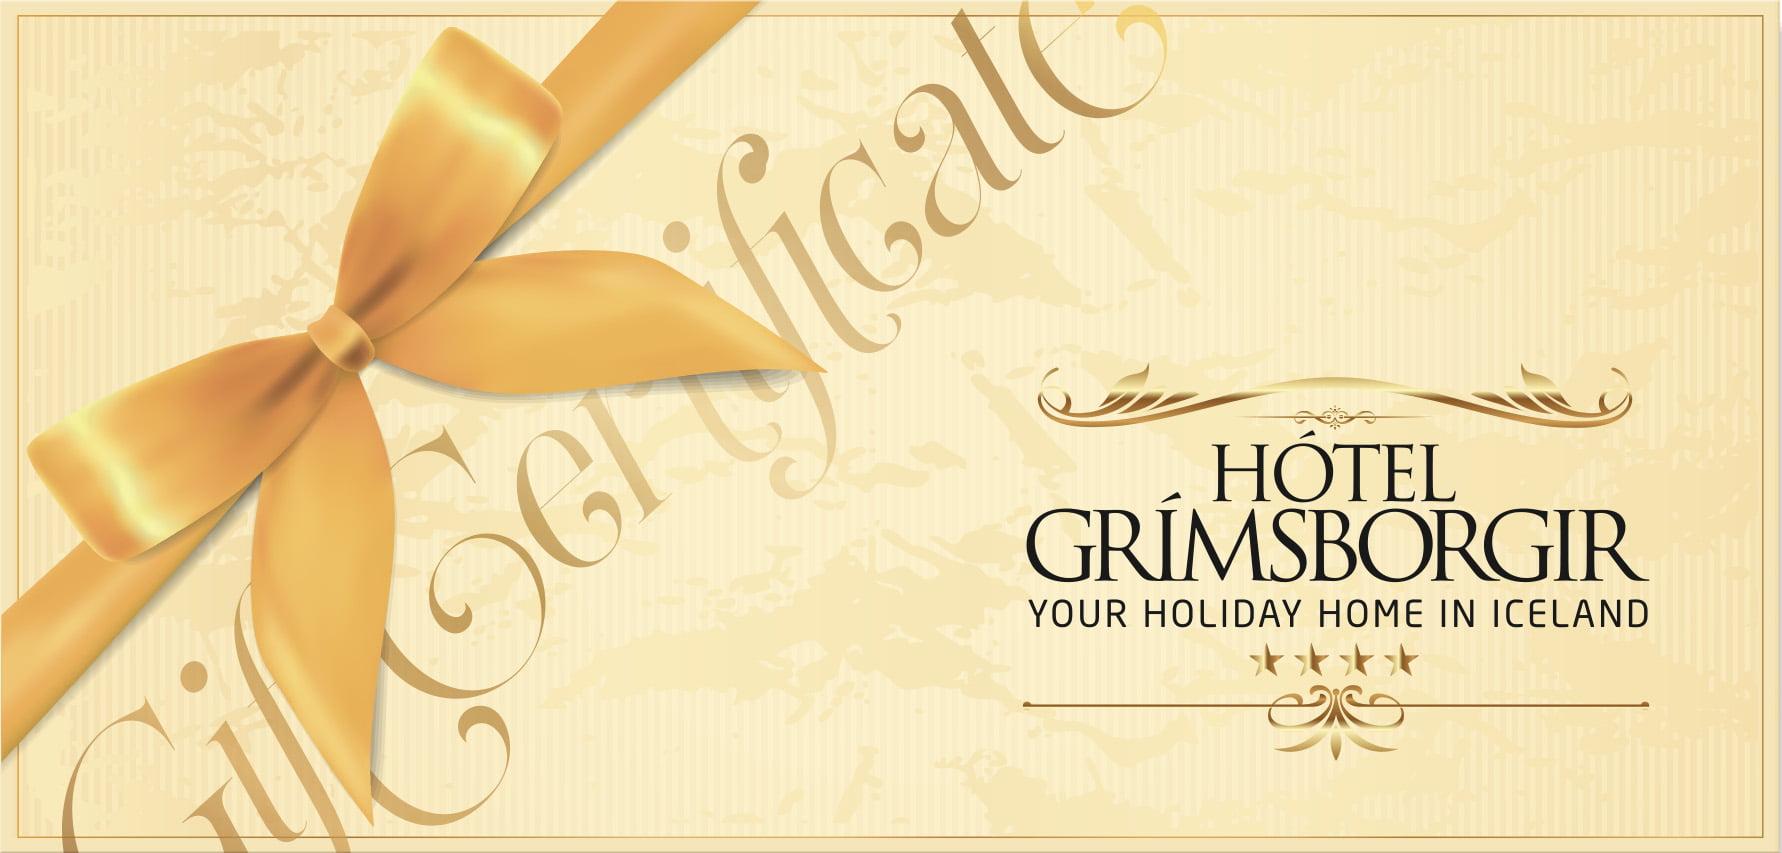 Gift Certificate Hotel Grimsborgir